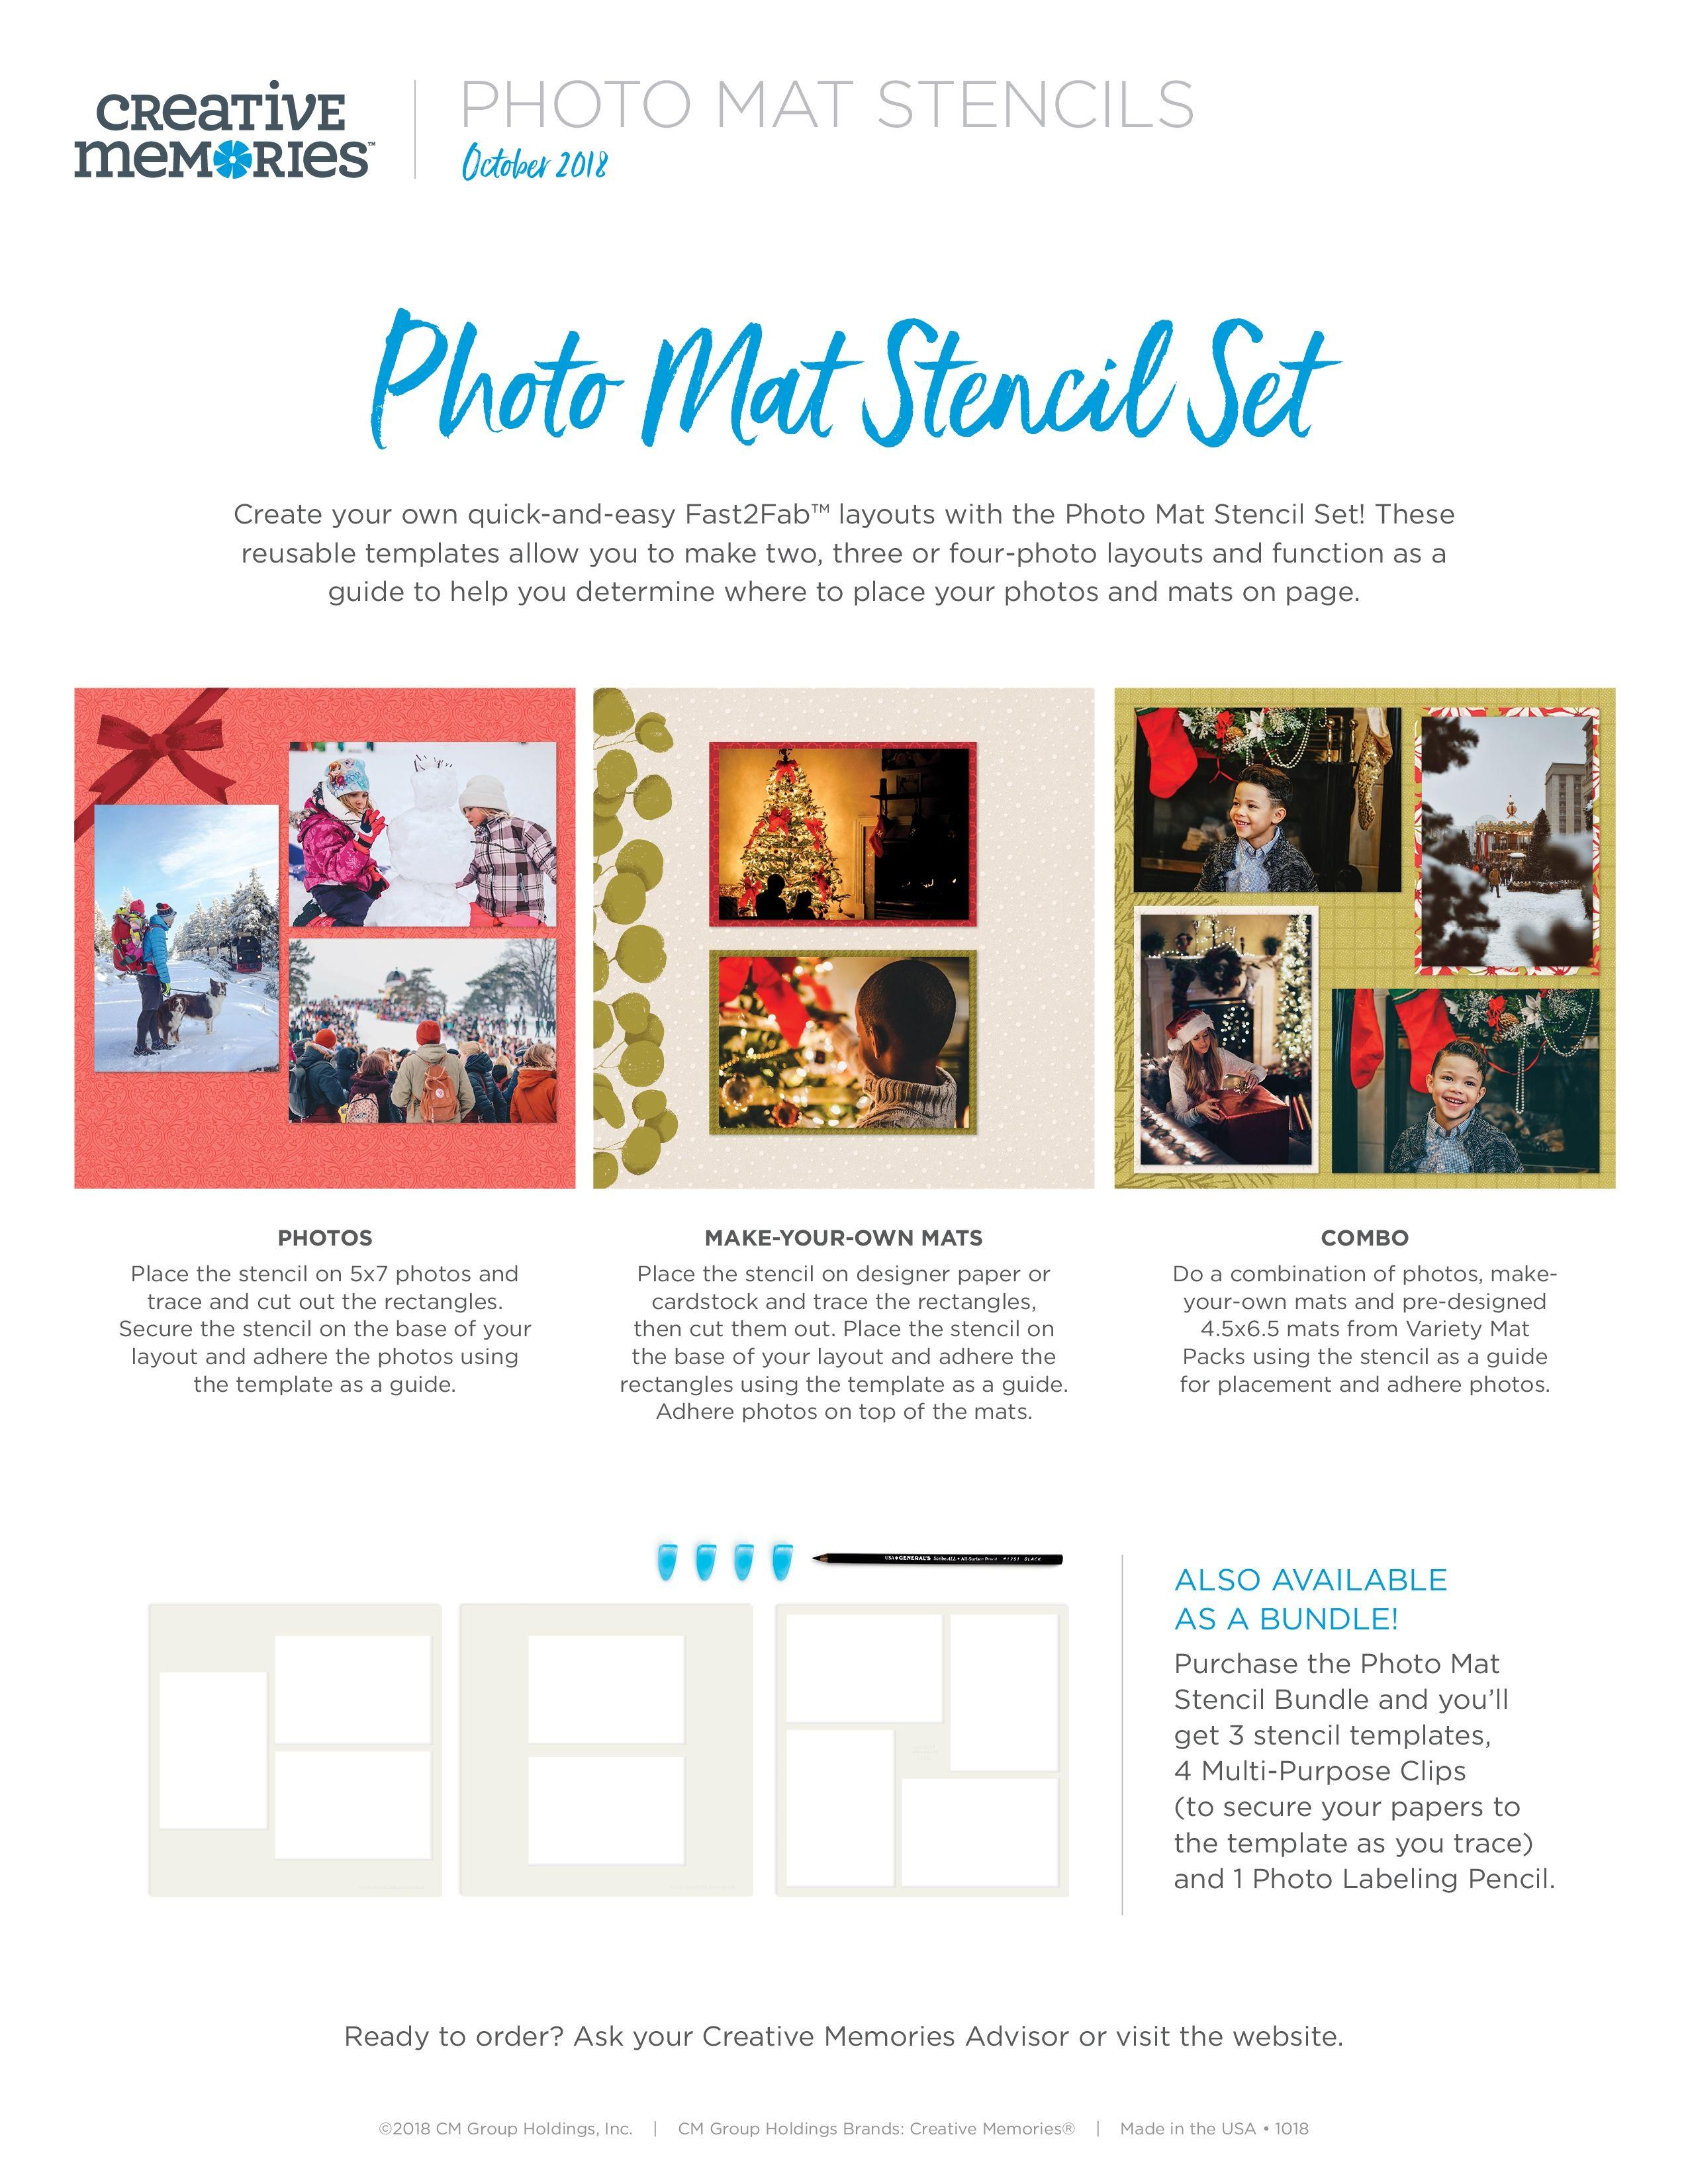 Creative Memories Photo Mat Stencil Set October 2018 Creative Memories Photo Memories Xoxo Card